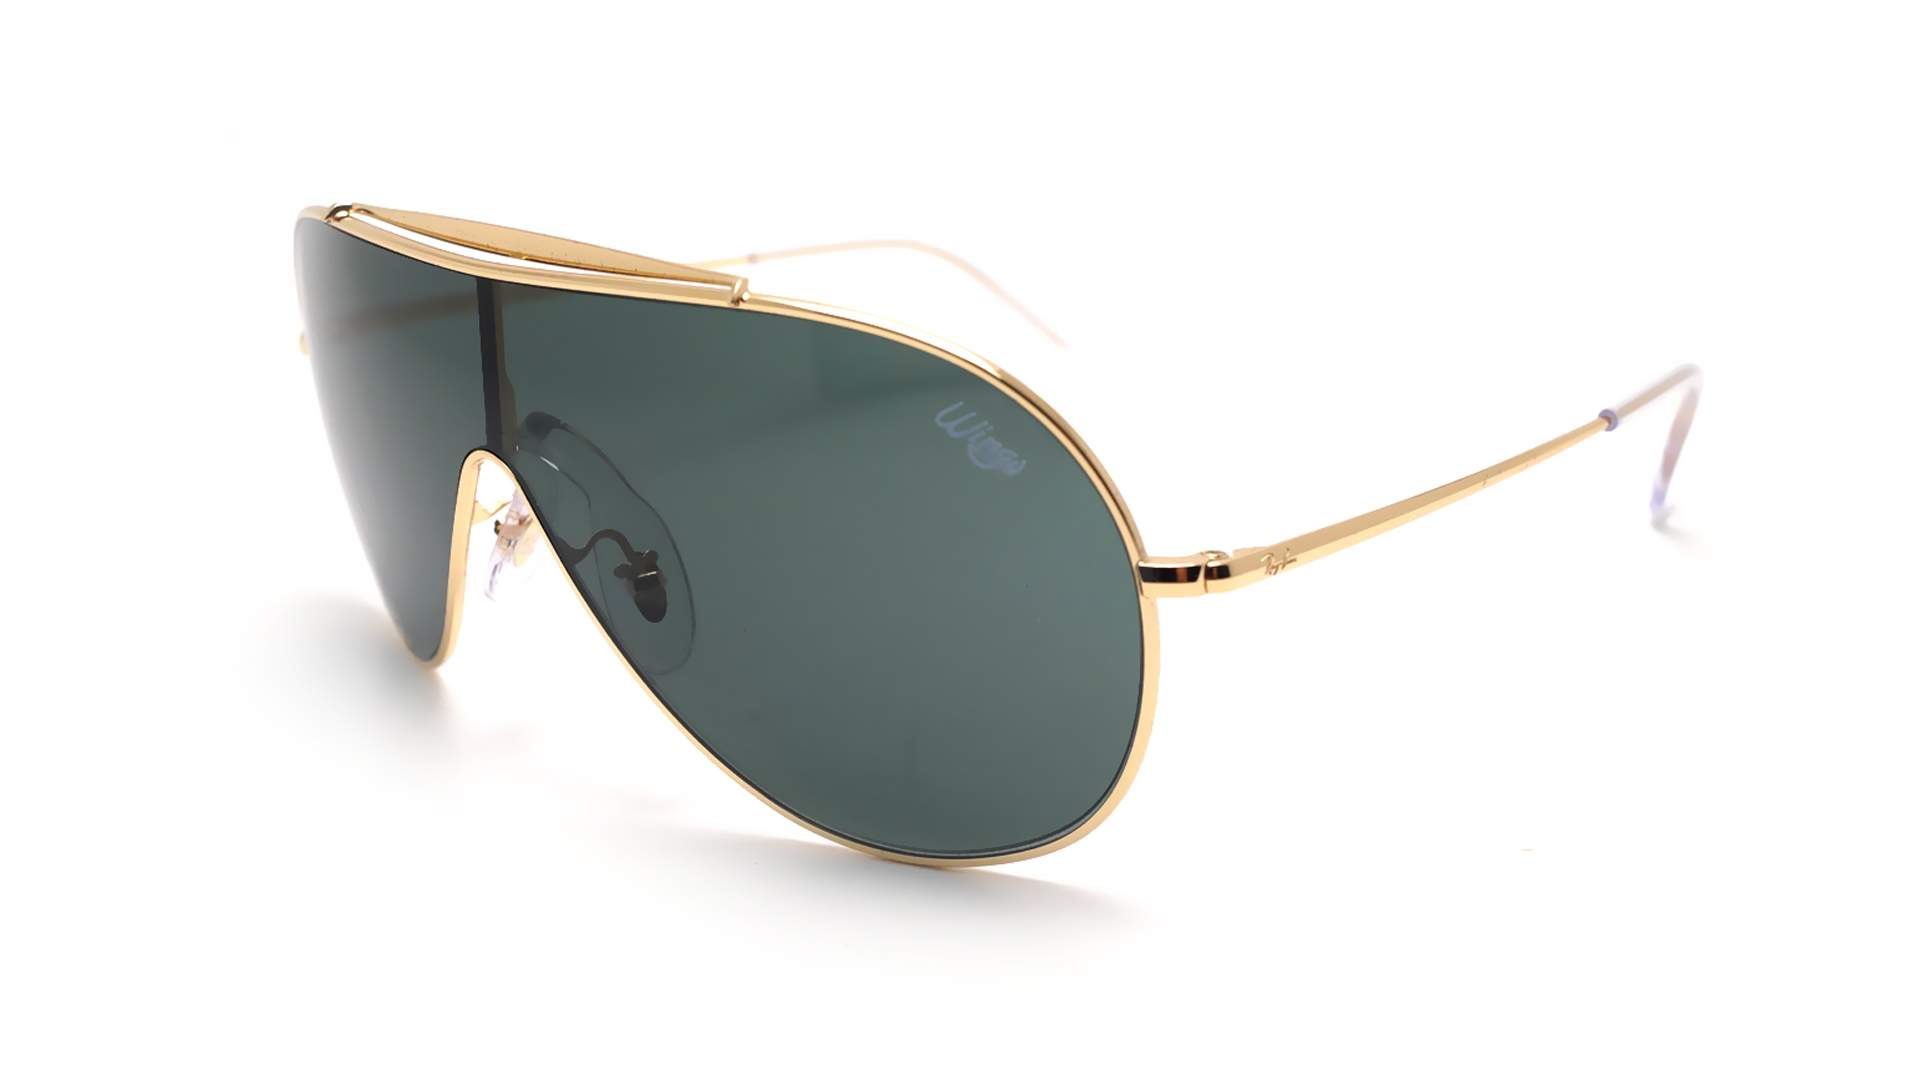 c15d0b90ff Sunglasses Ray-Ban Wings Gold RB3597 9050 71 33-18 Medium